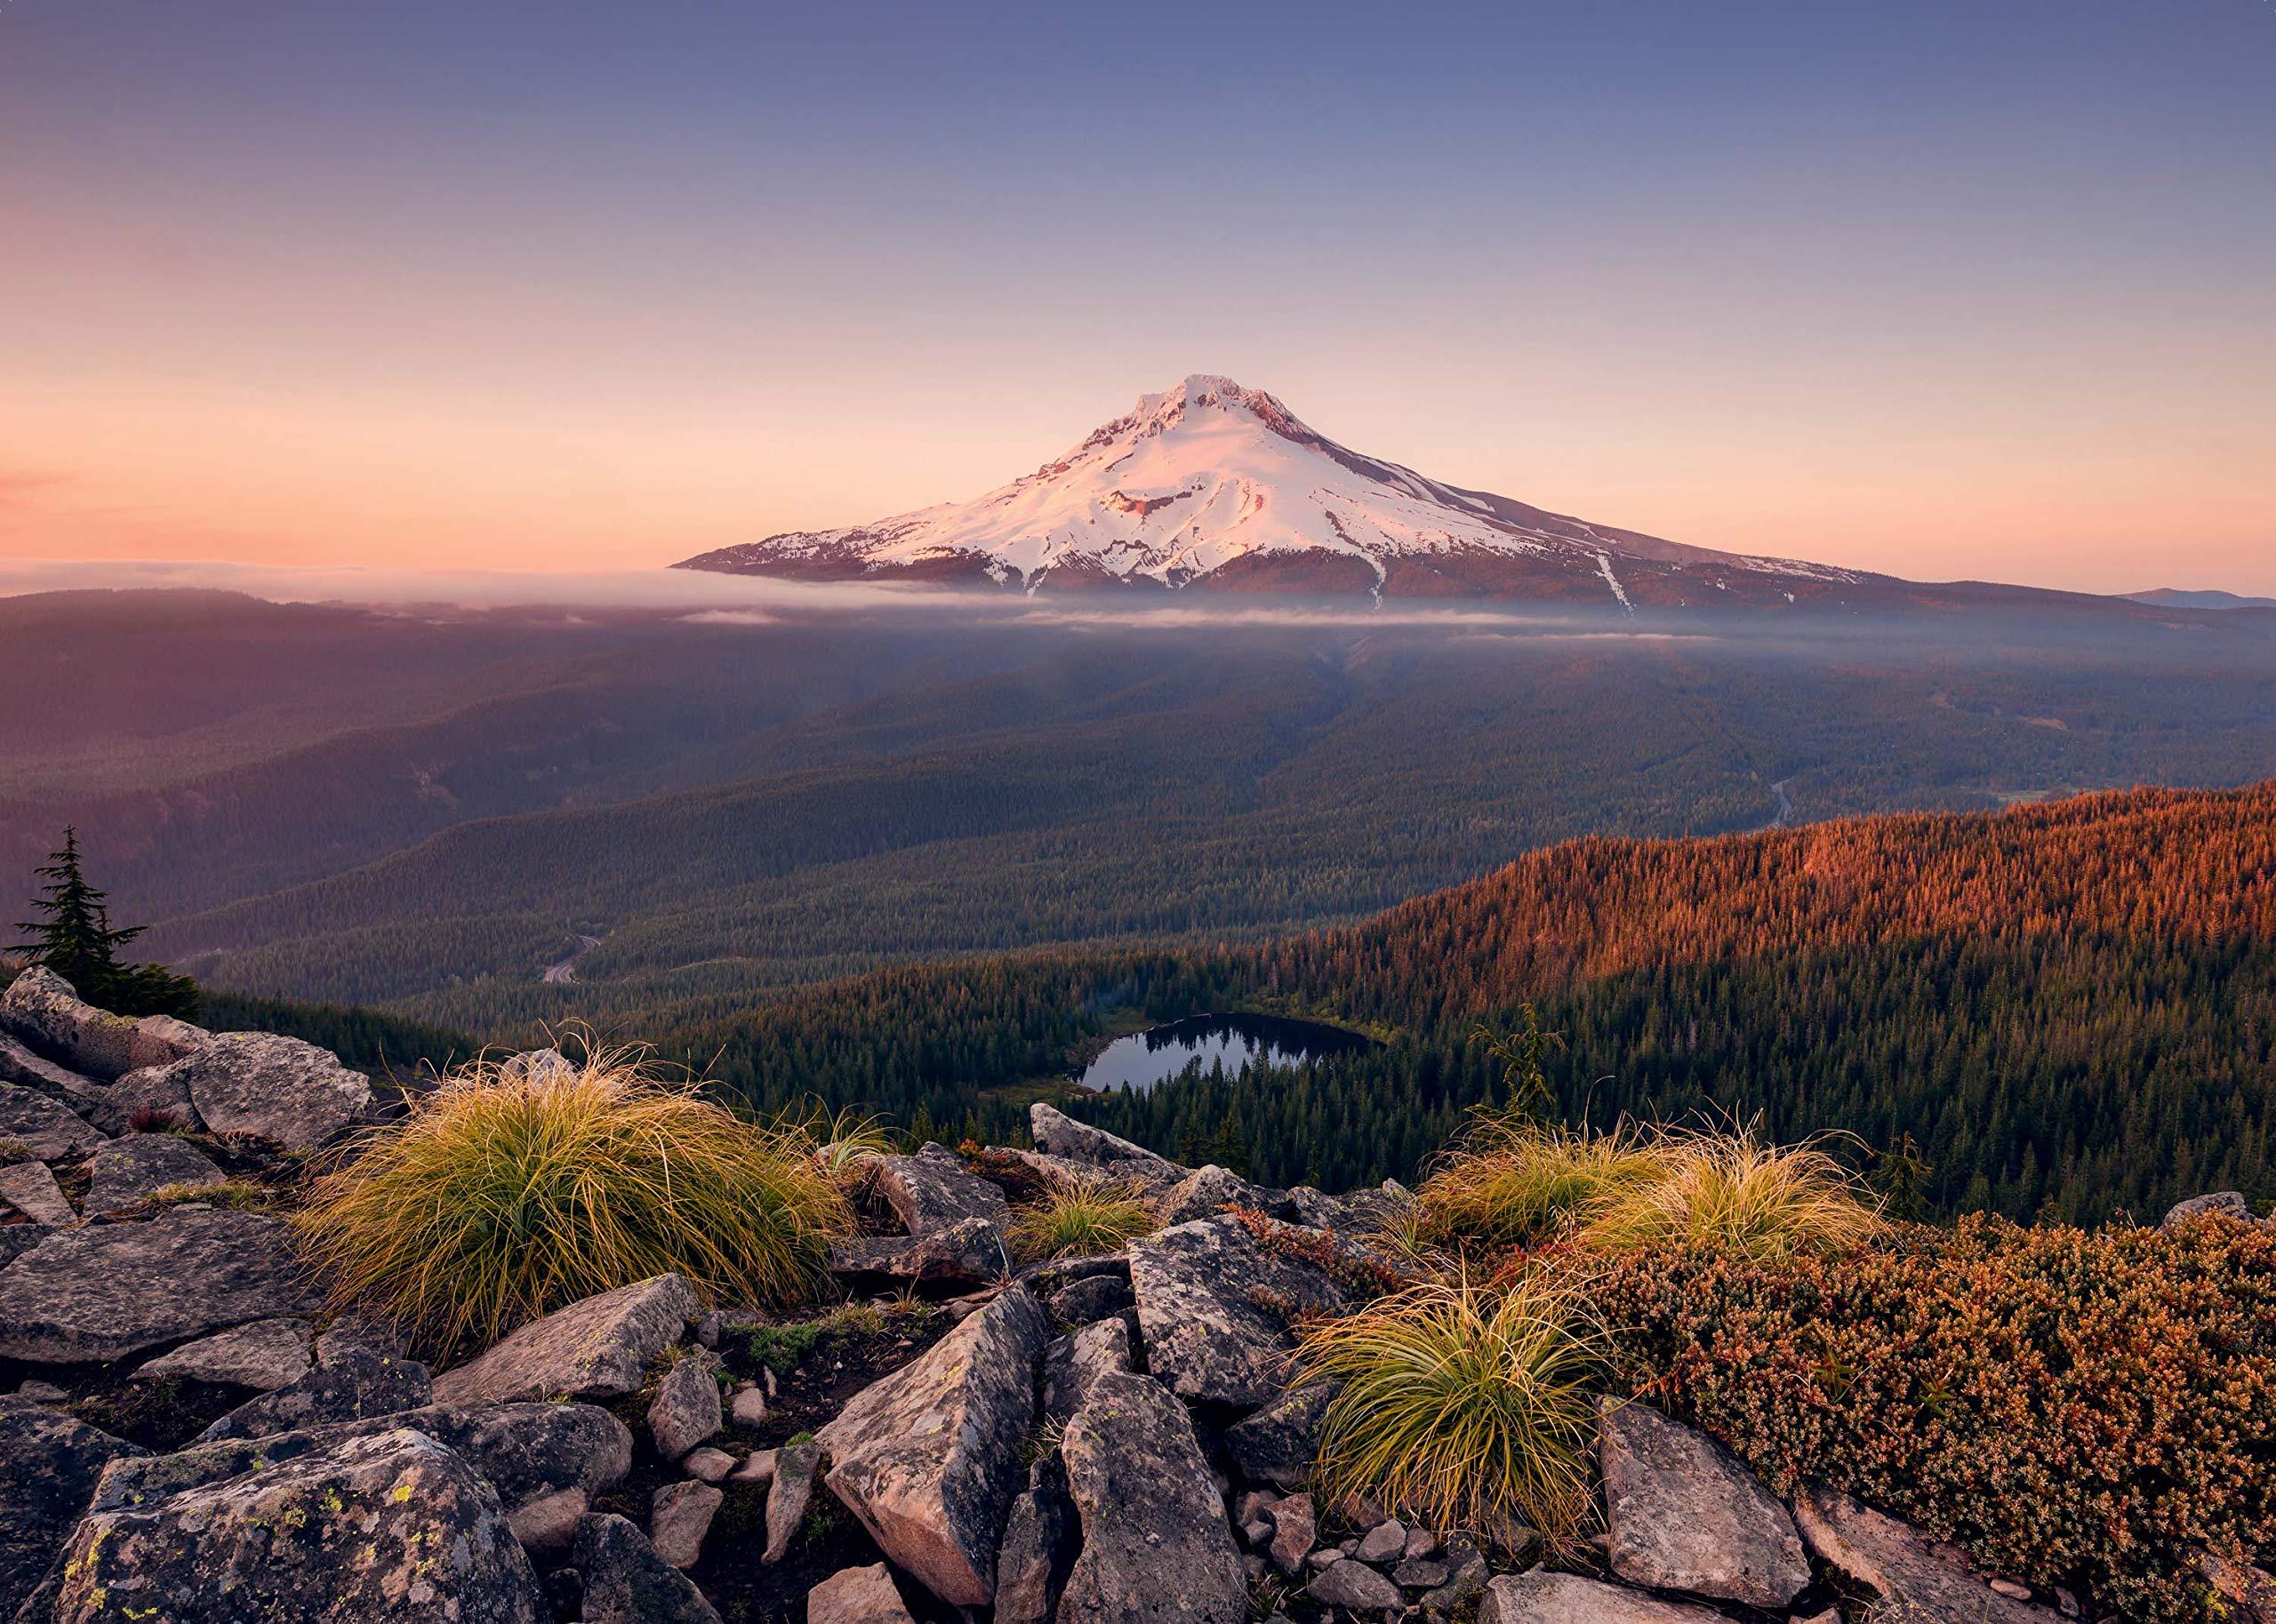 Ravensburger-Erwachsenenpuzzle-15157-Stratovulkan-Mount-Hood-in-Oregon-USA-Puzzle